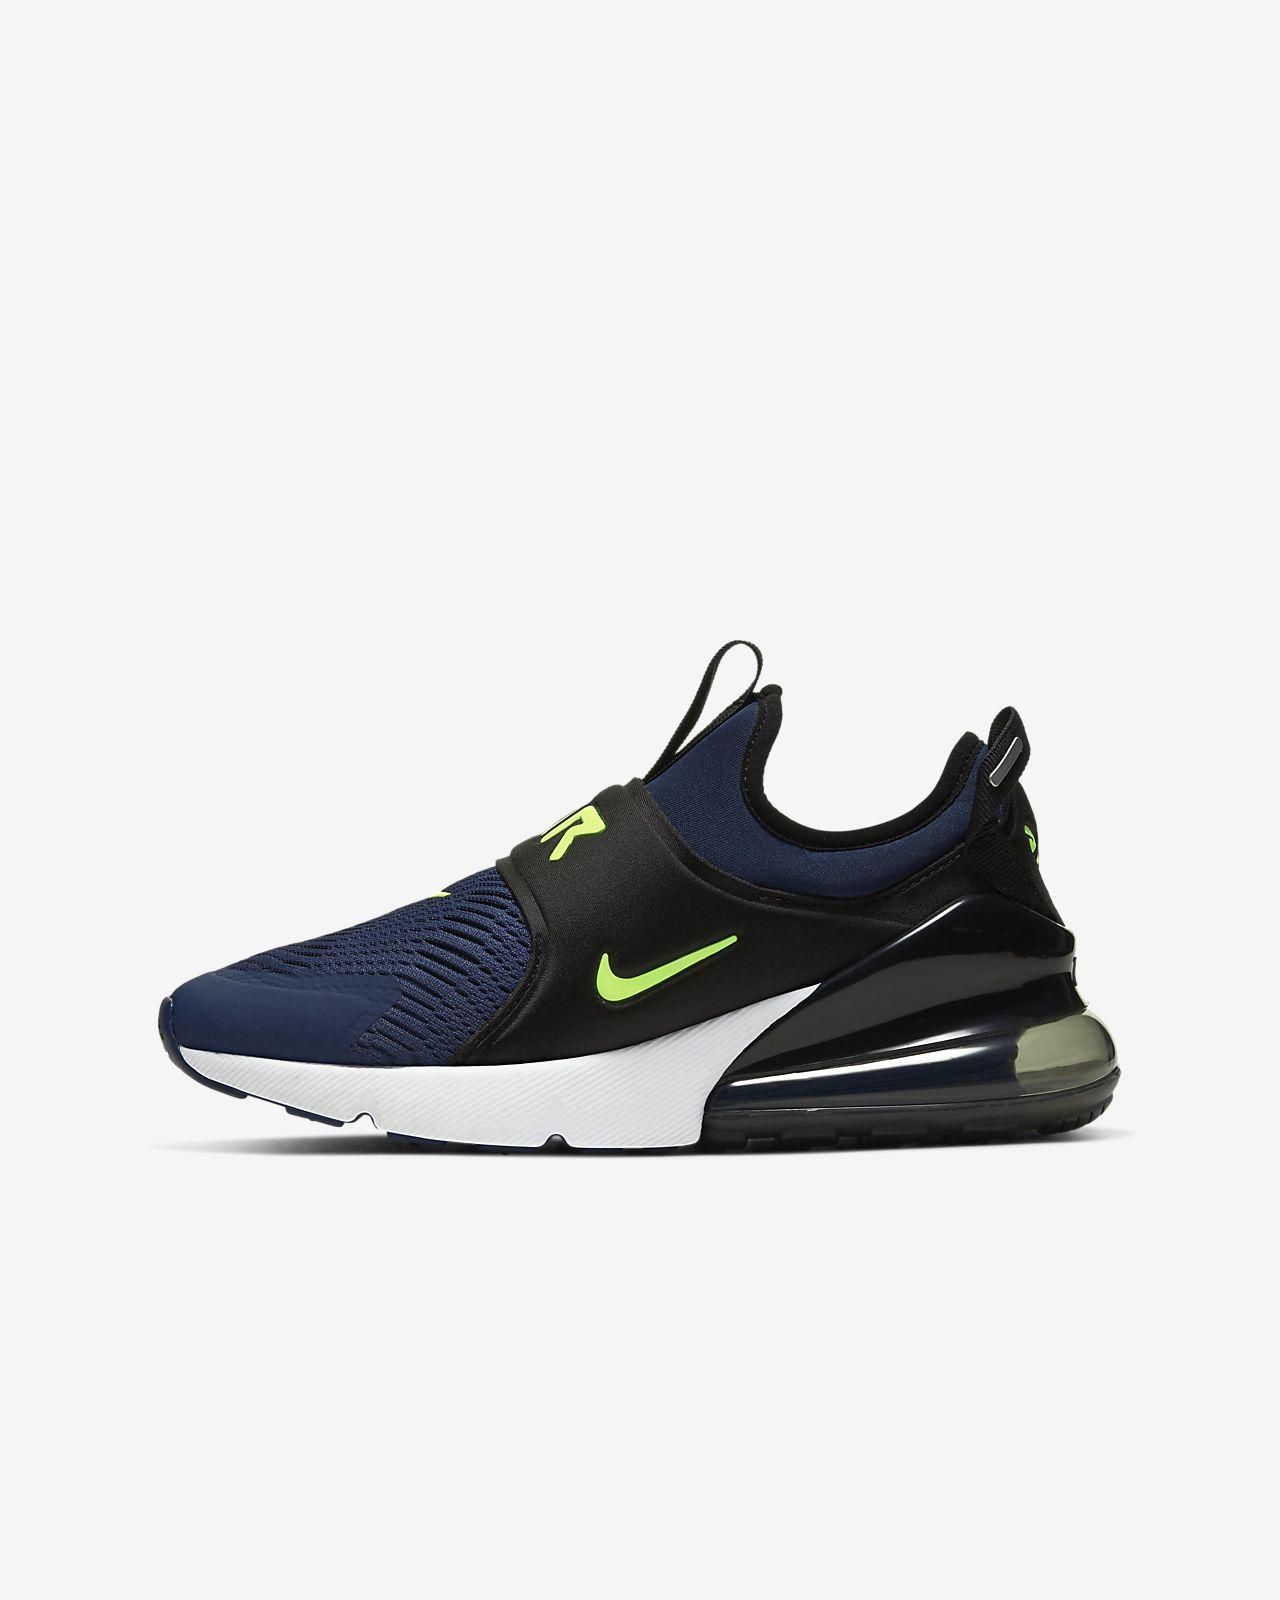 Nike Air Max 270 Extreme Big Kids' Shoe